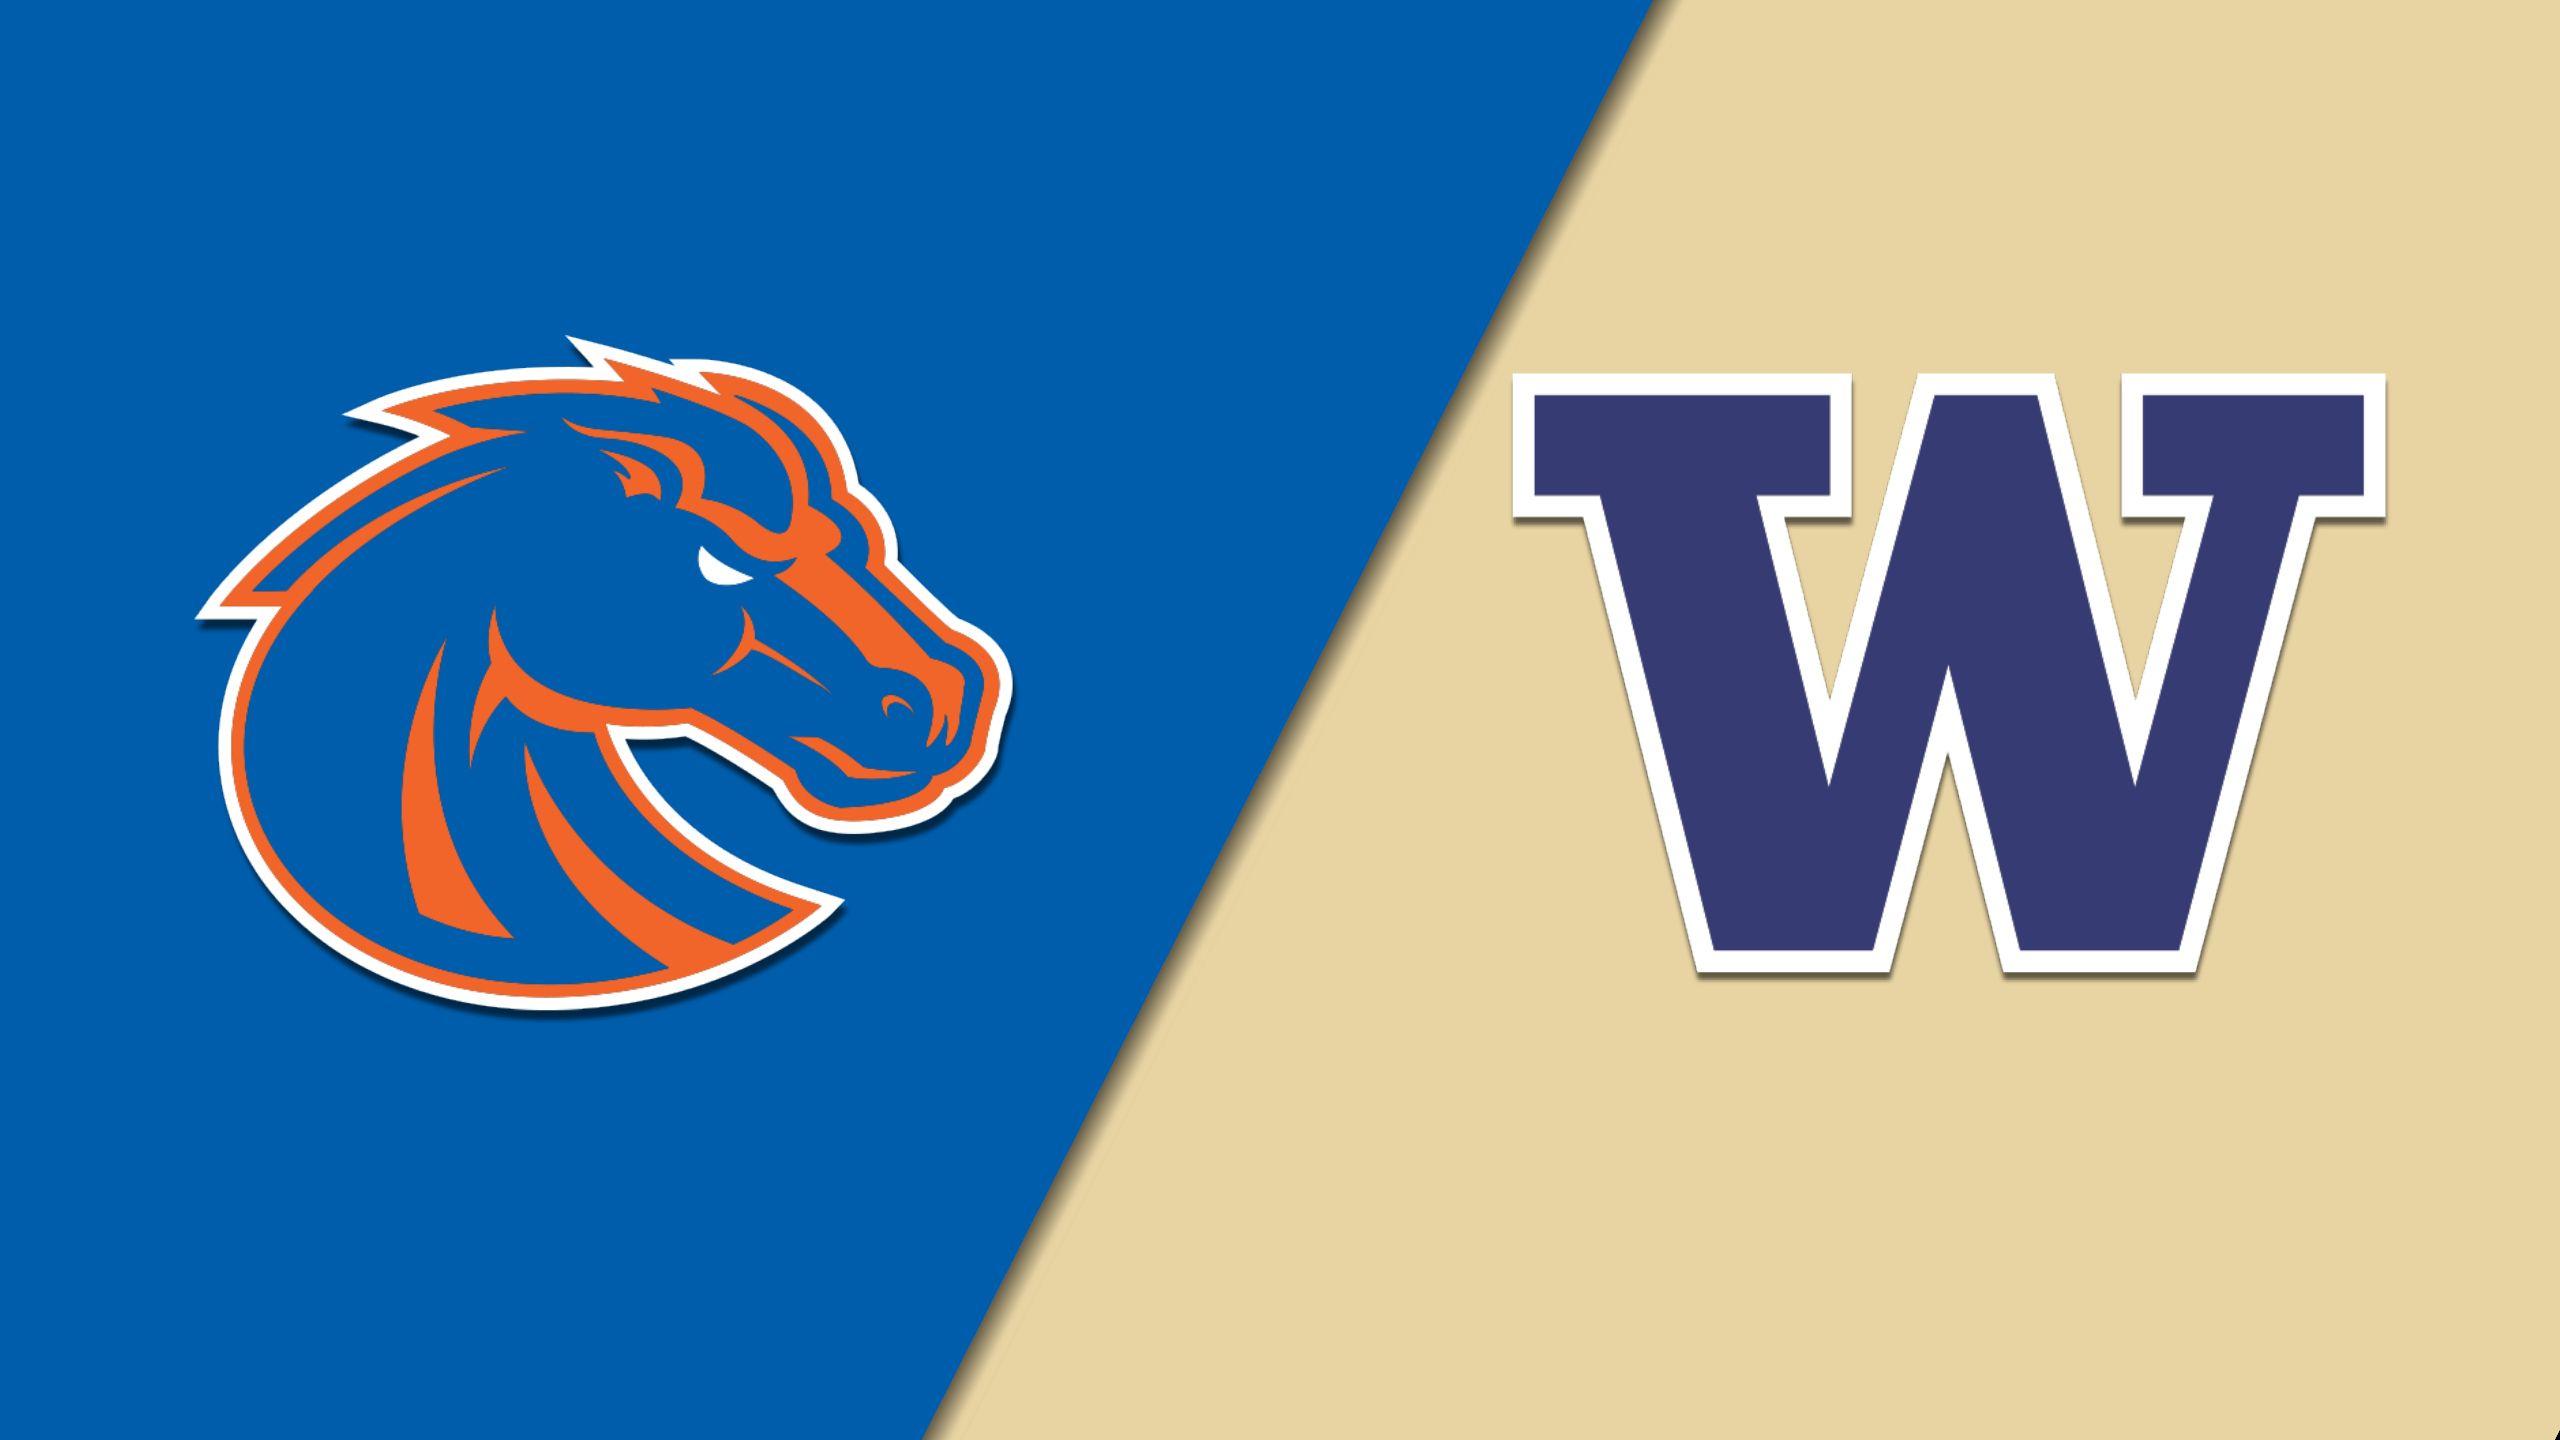 #4 Boise State vs. #5 Washington (First Round) (NIT)